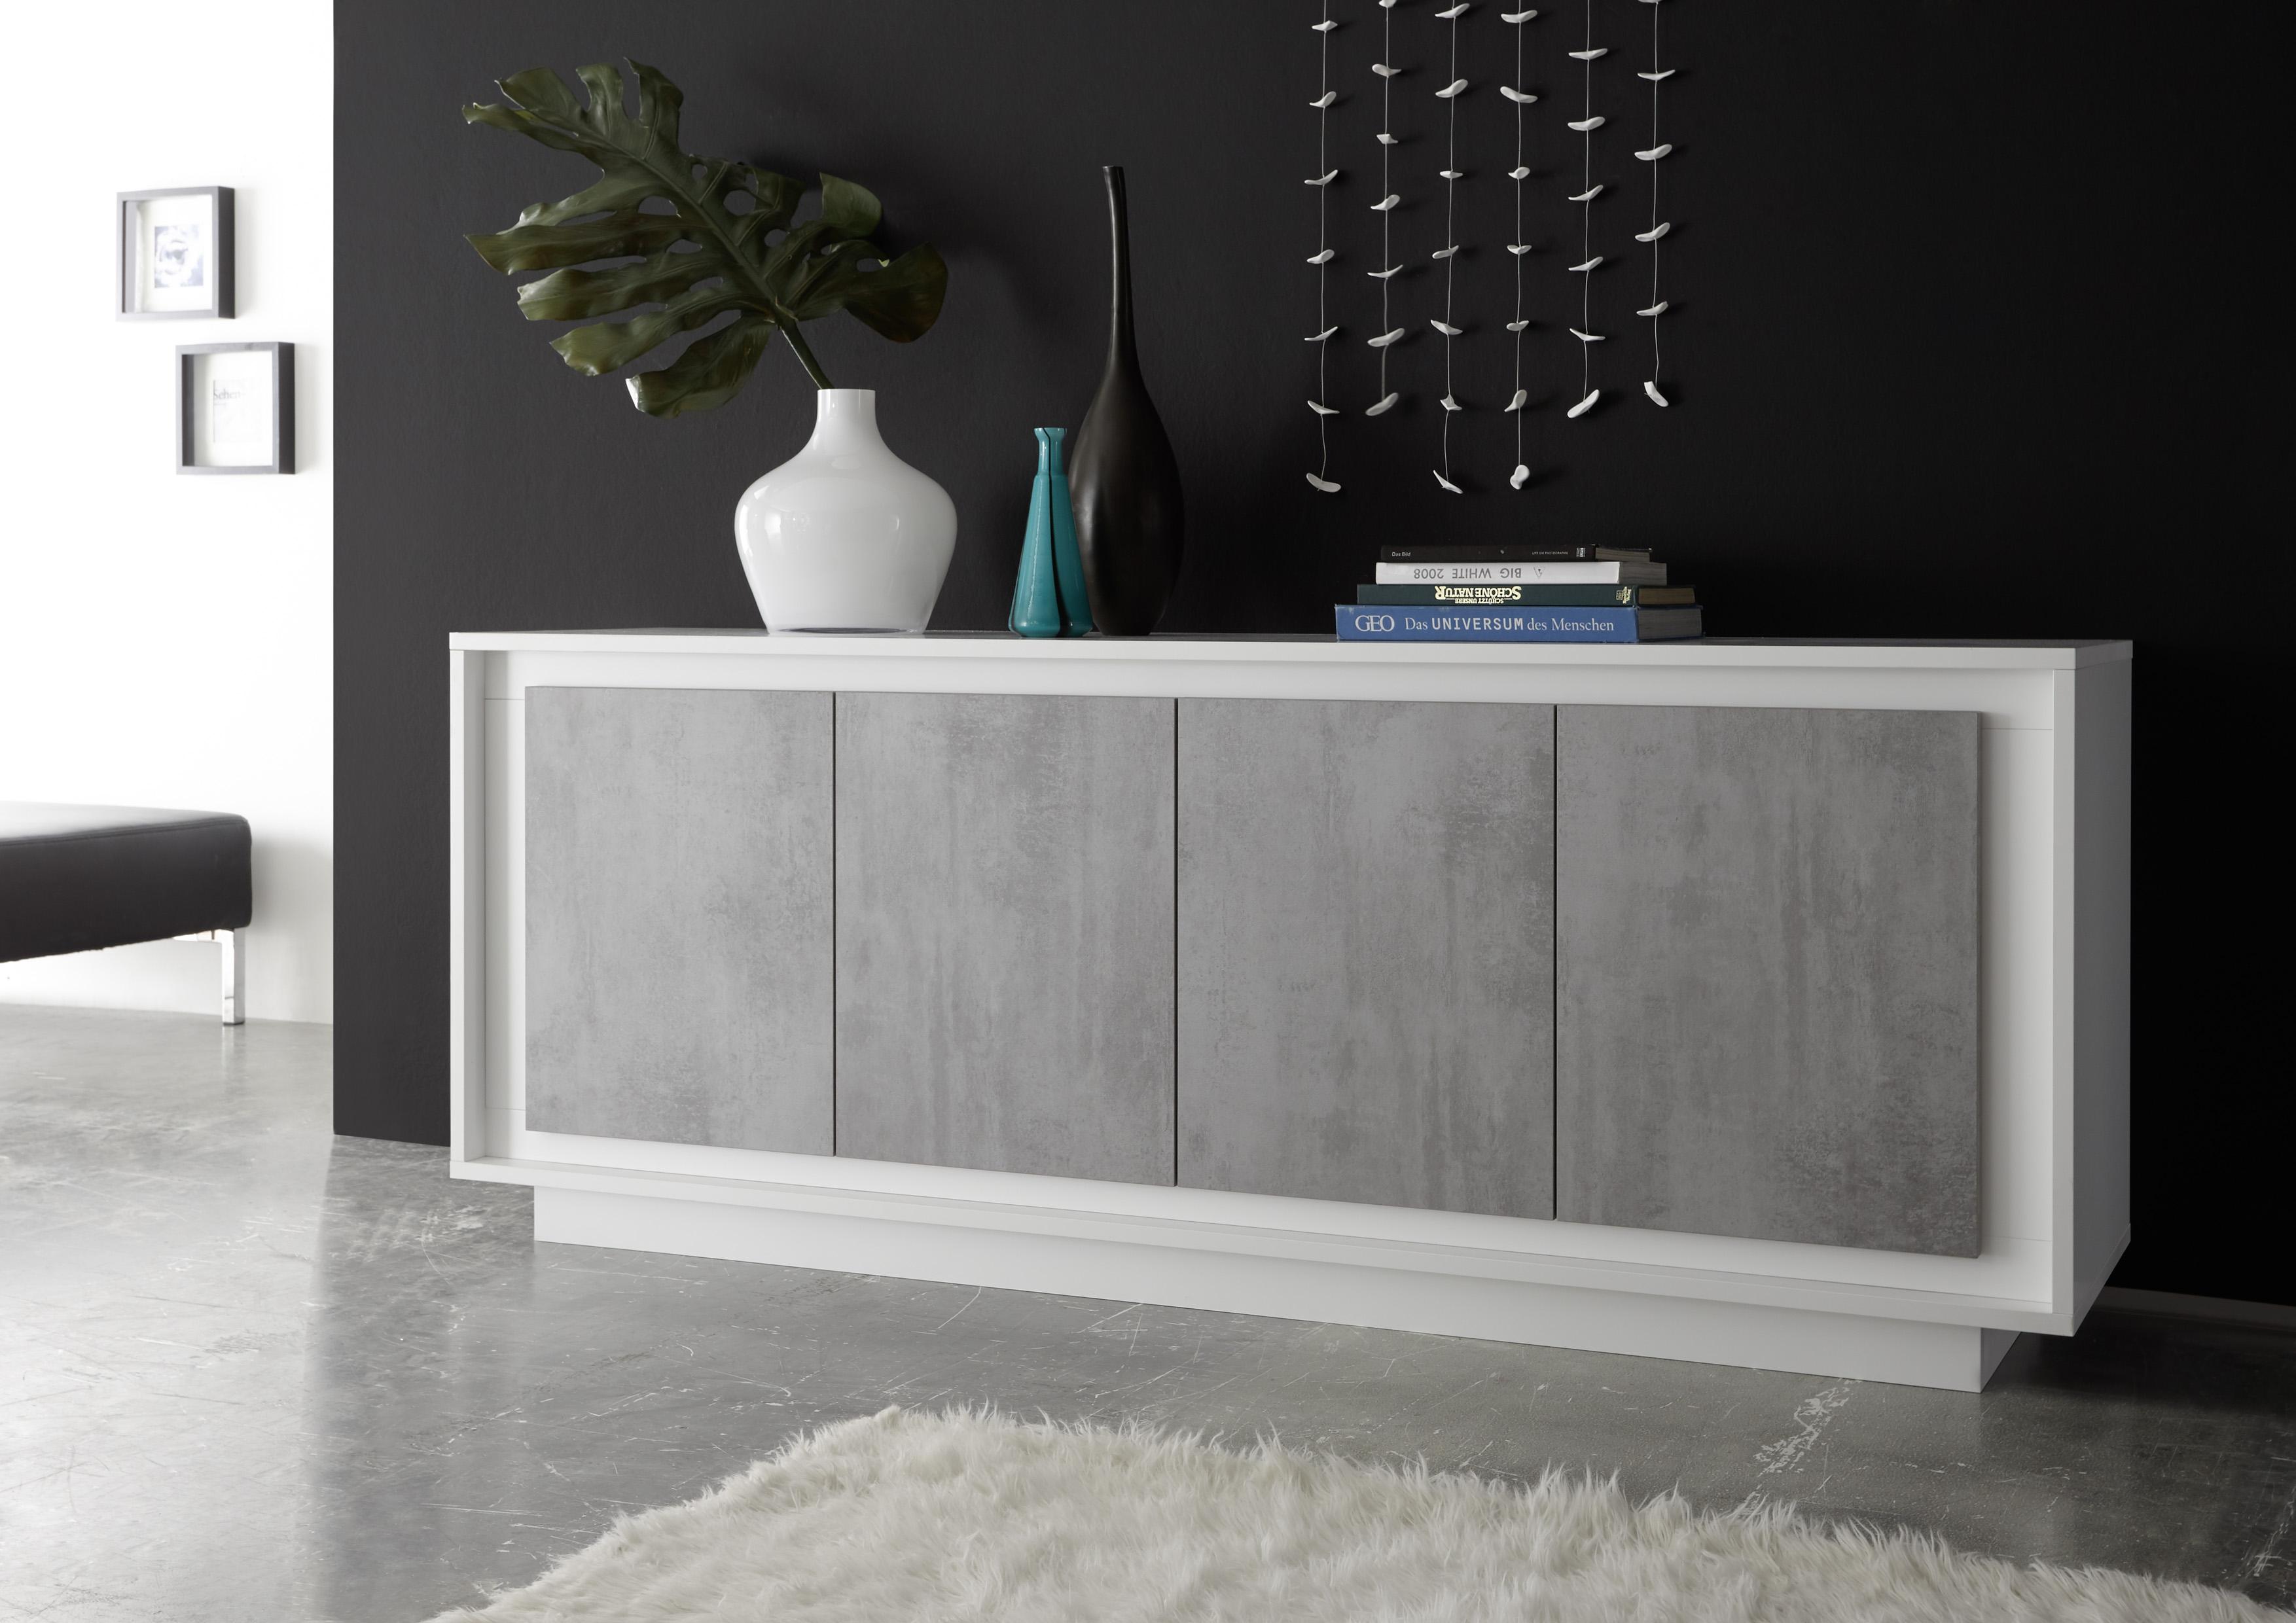 Hoogglans Kast Wit : Verdi tv kast zwevend tv meubel hoogglans wit zwart te koop